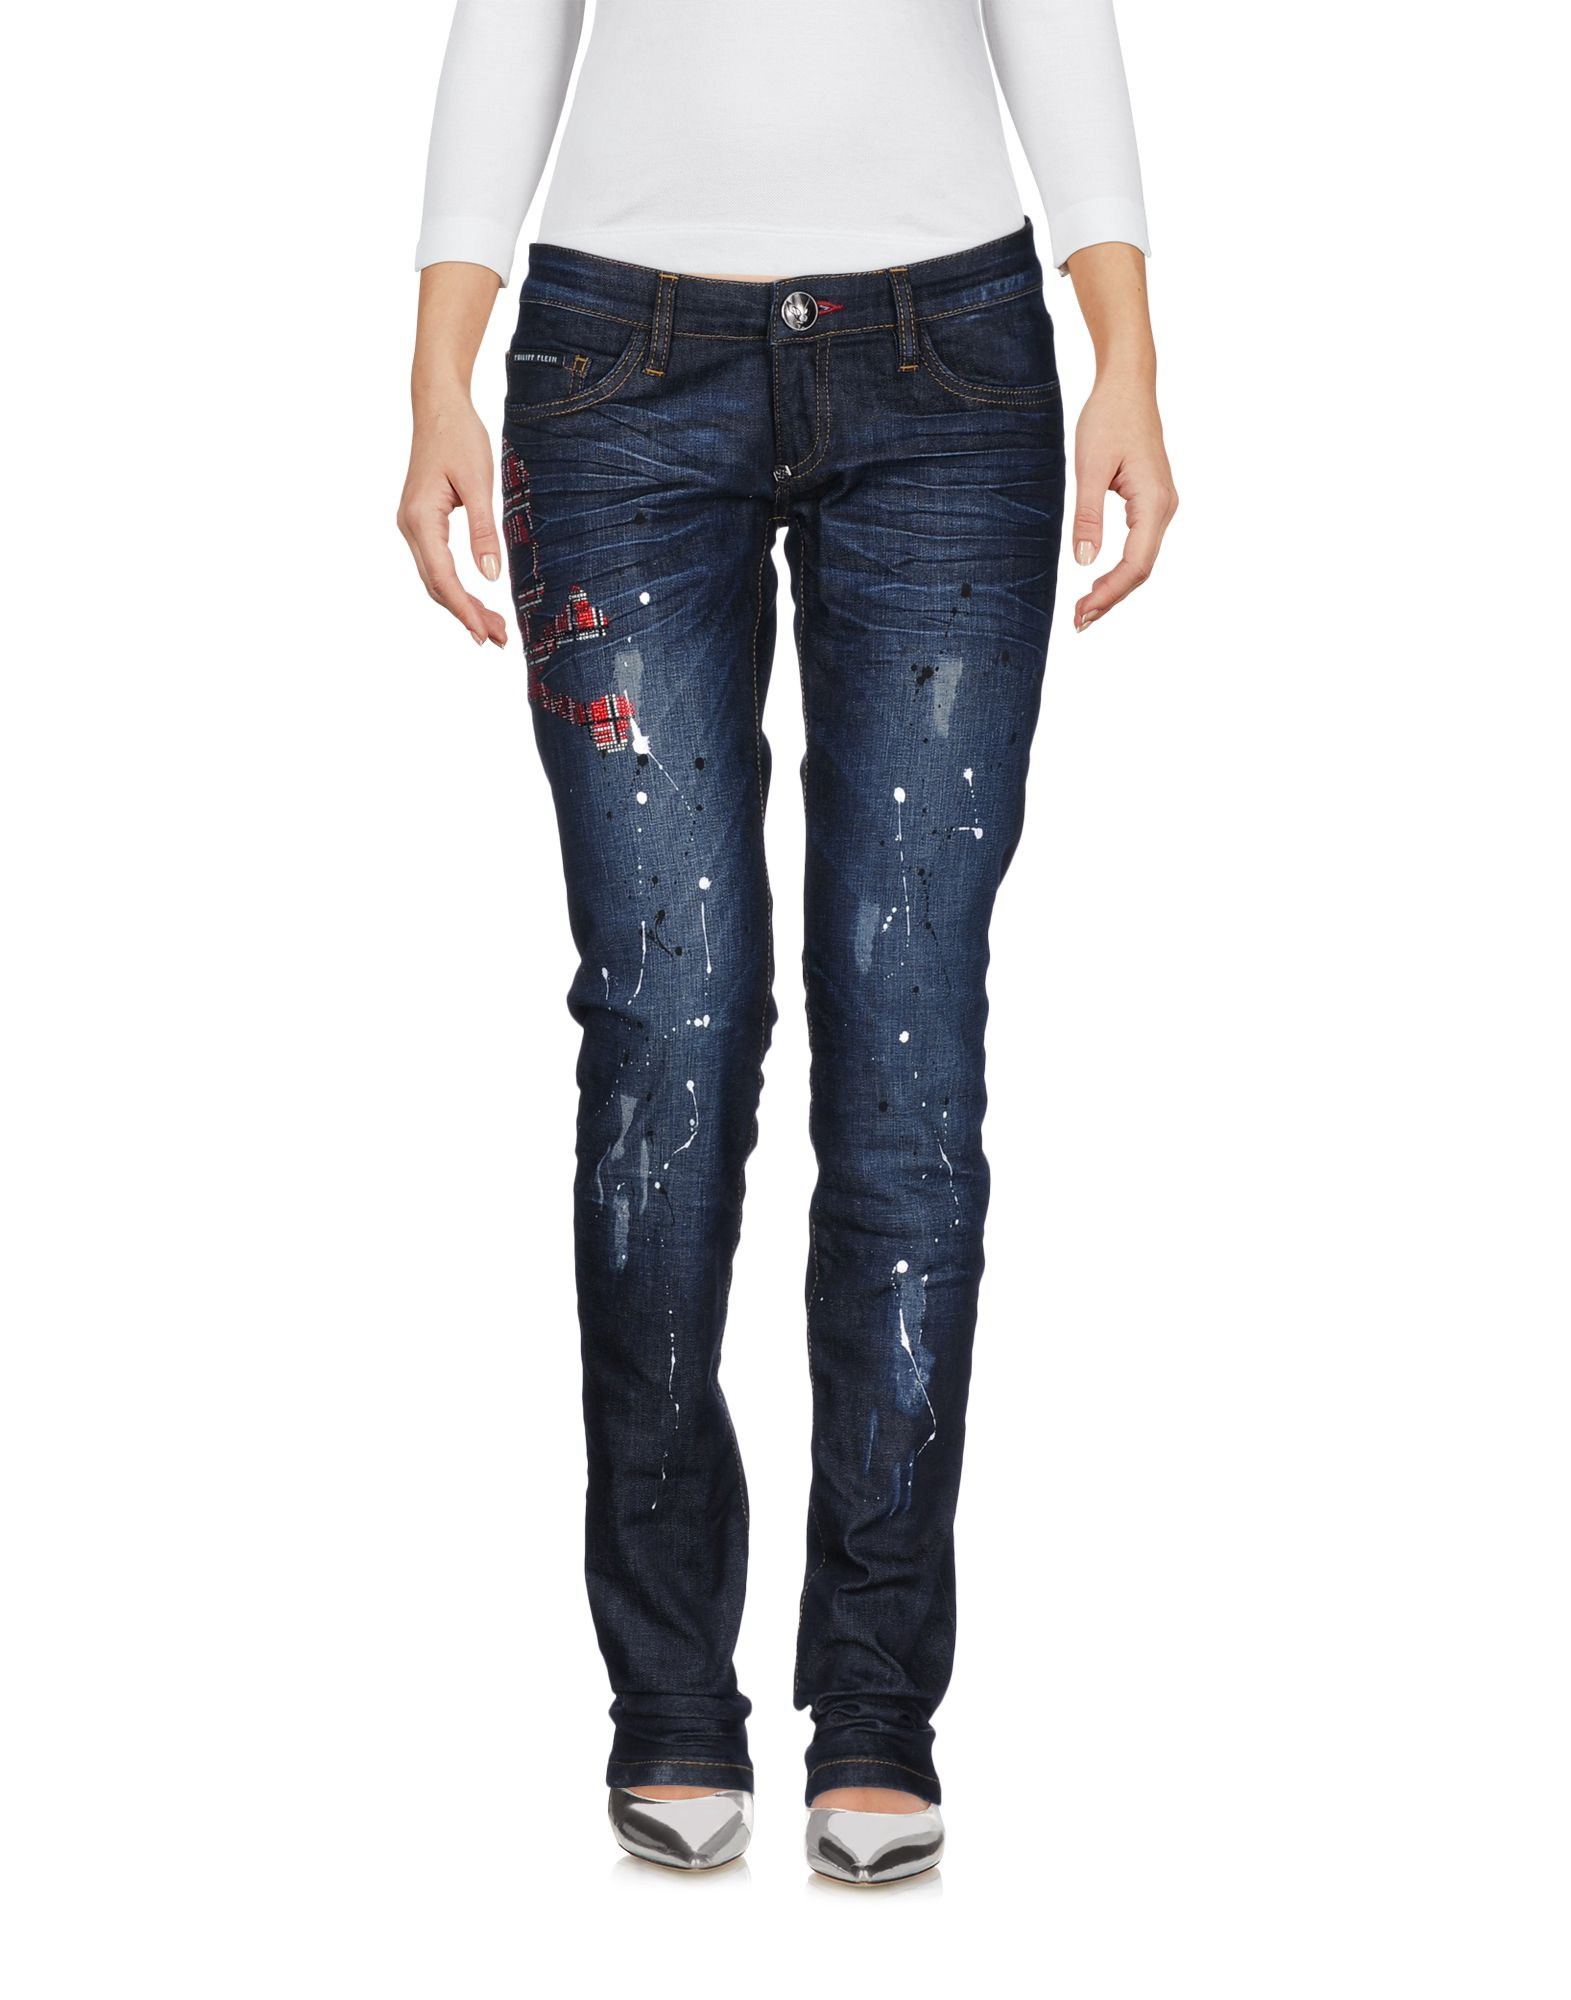 Pantaloni Jeans Philipp Plein Donna - Acquista online su HyO5inXD